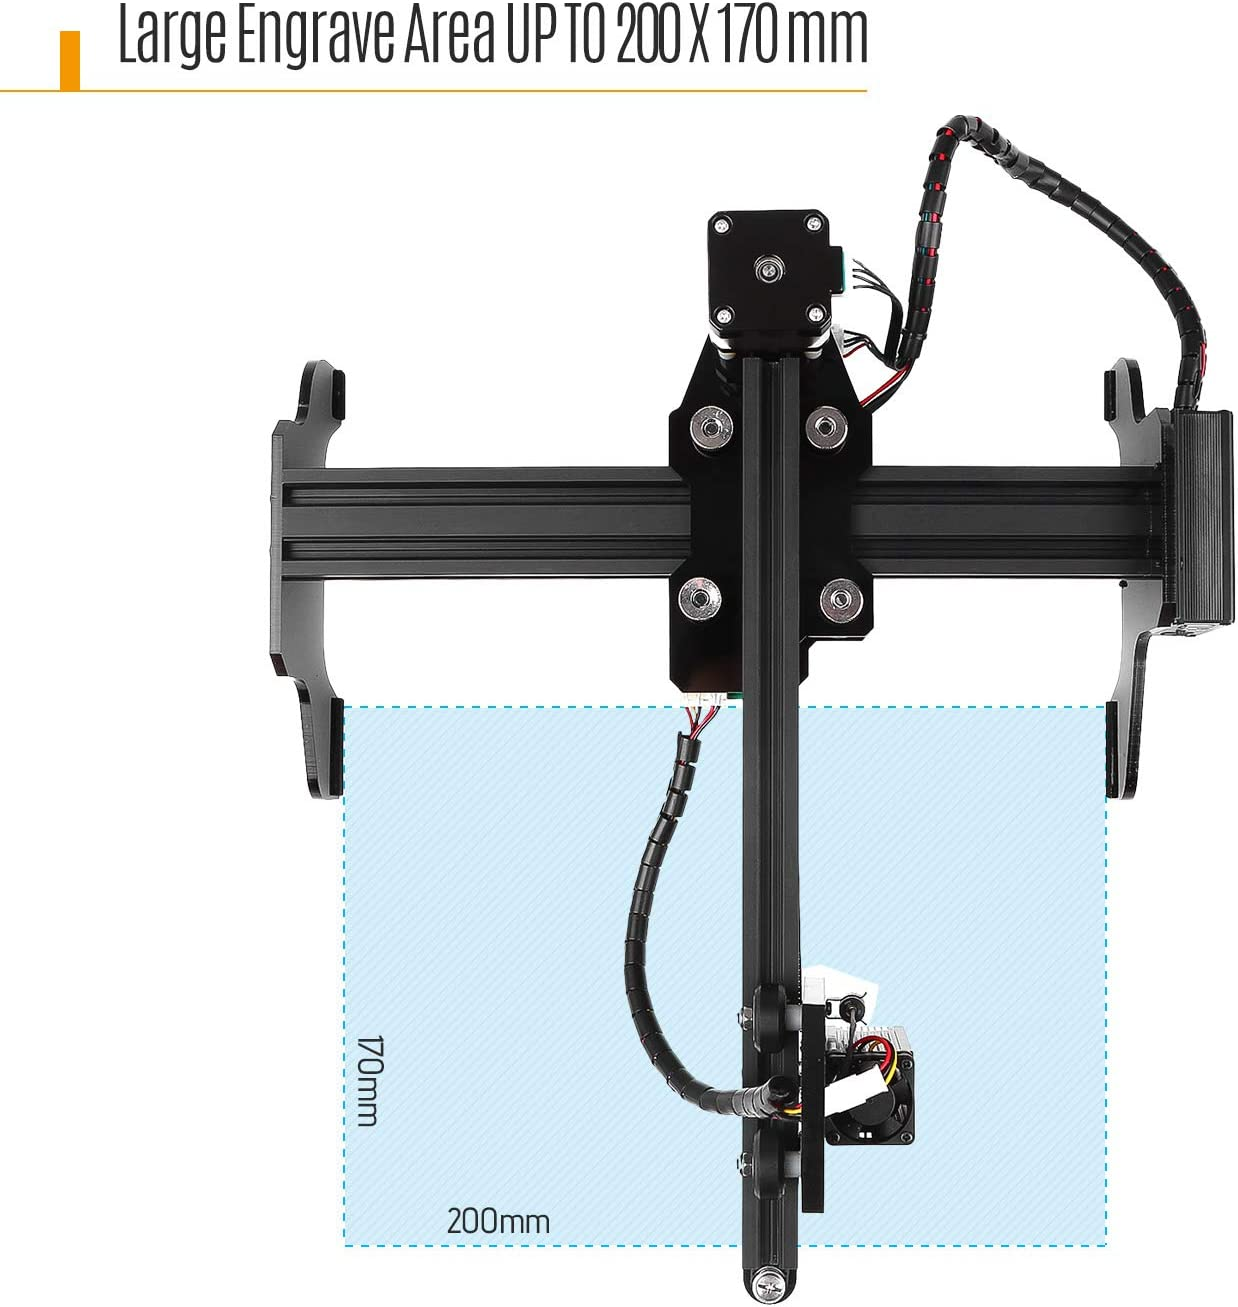 KKmoon Graviermaschine,7W La-ser engraver Maschine Upgrated Version La-sergravur Drucker USB CNC engraver f/ür Win 7//8//10 XP Android 4.2